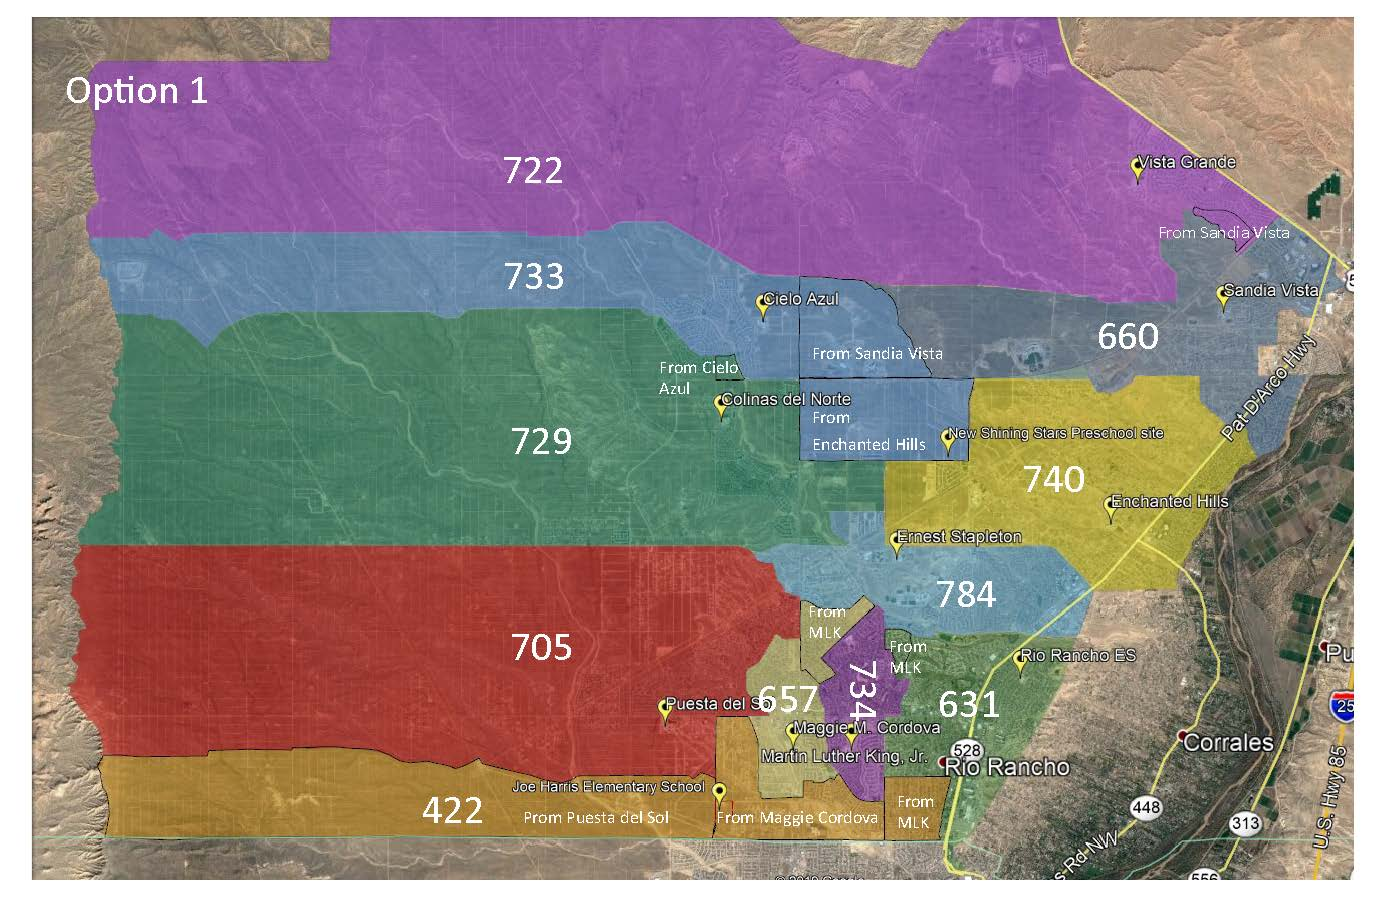 2020 boundary option 1